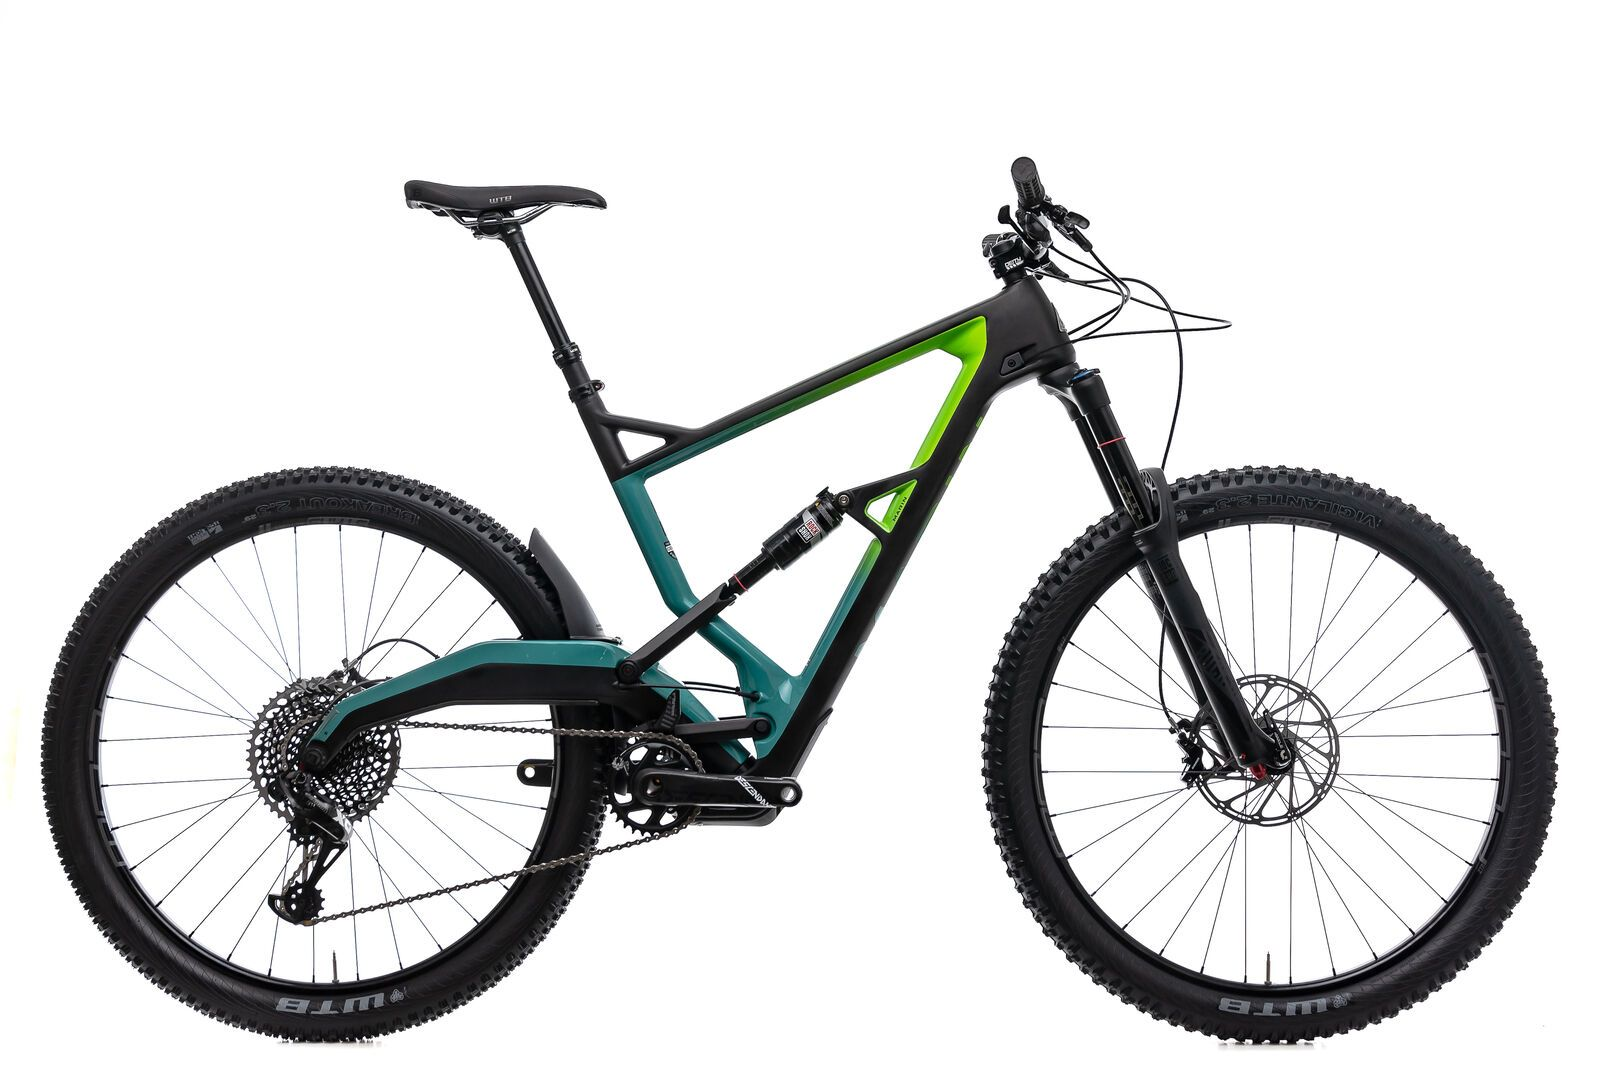 2019 Marin Wolf Ridge 9 Mountain Bike X Large 29 Carbon Sram X01